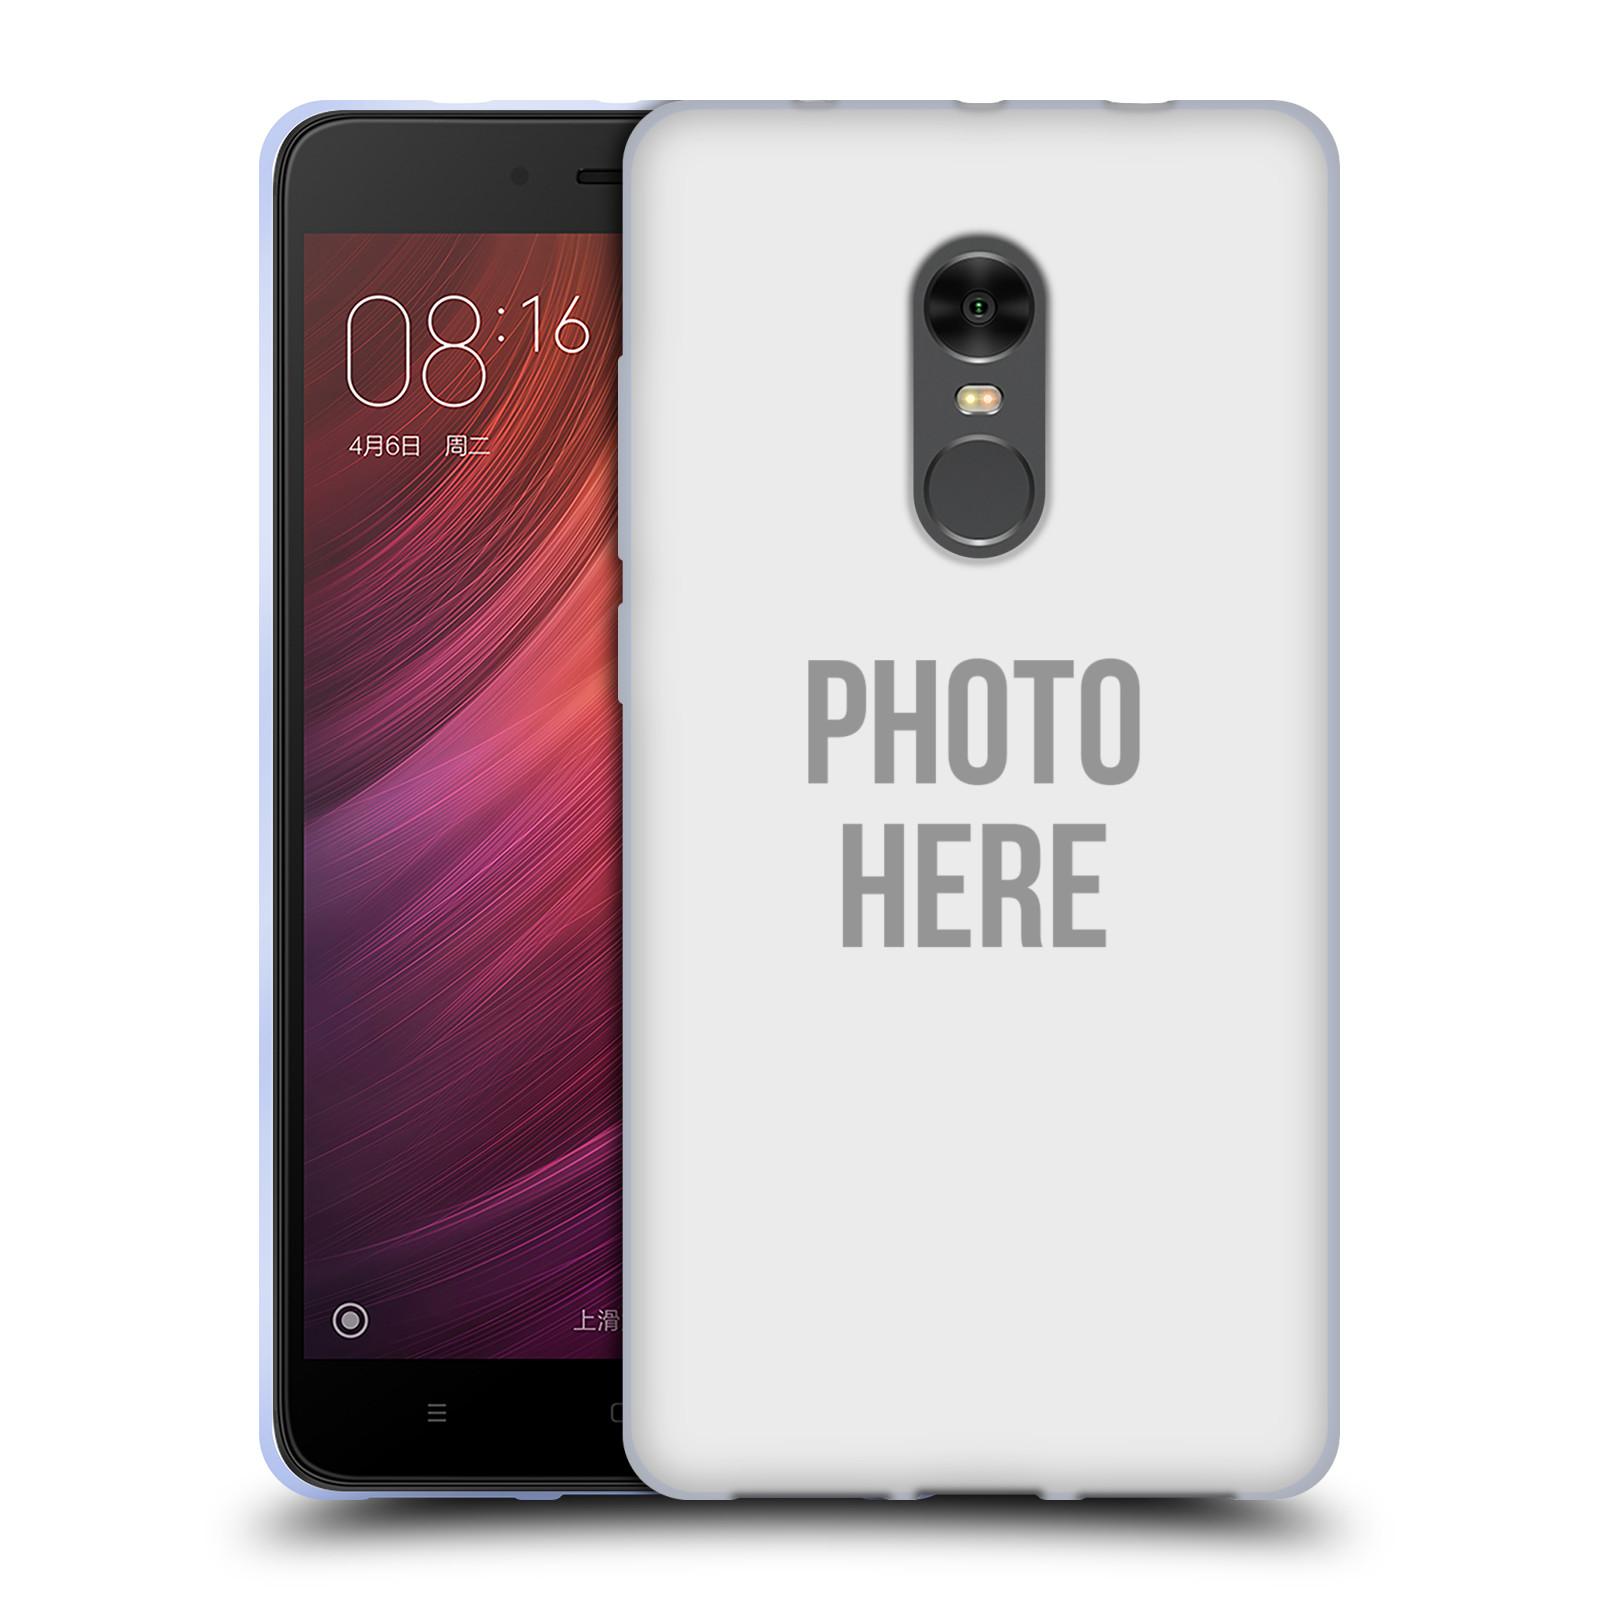 Silikonové pouzdro na mobil Xiaomi Redmi Note 4 - Head Case - s vlastním motivem (Silikonový kryt či obal na mobilní telefon Xiaomi Redmi Note 4 s vlastním motivem)